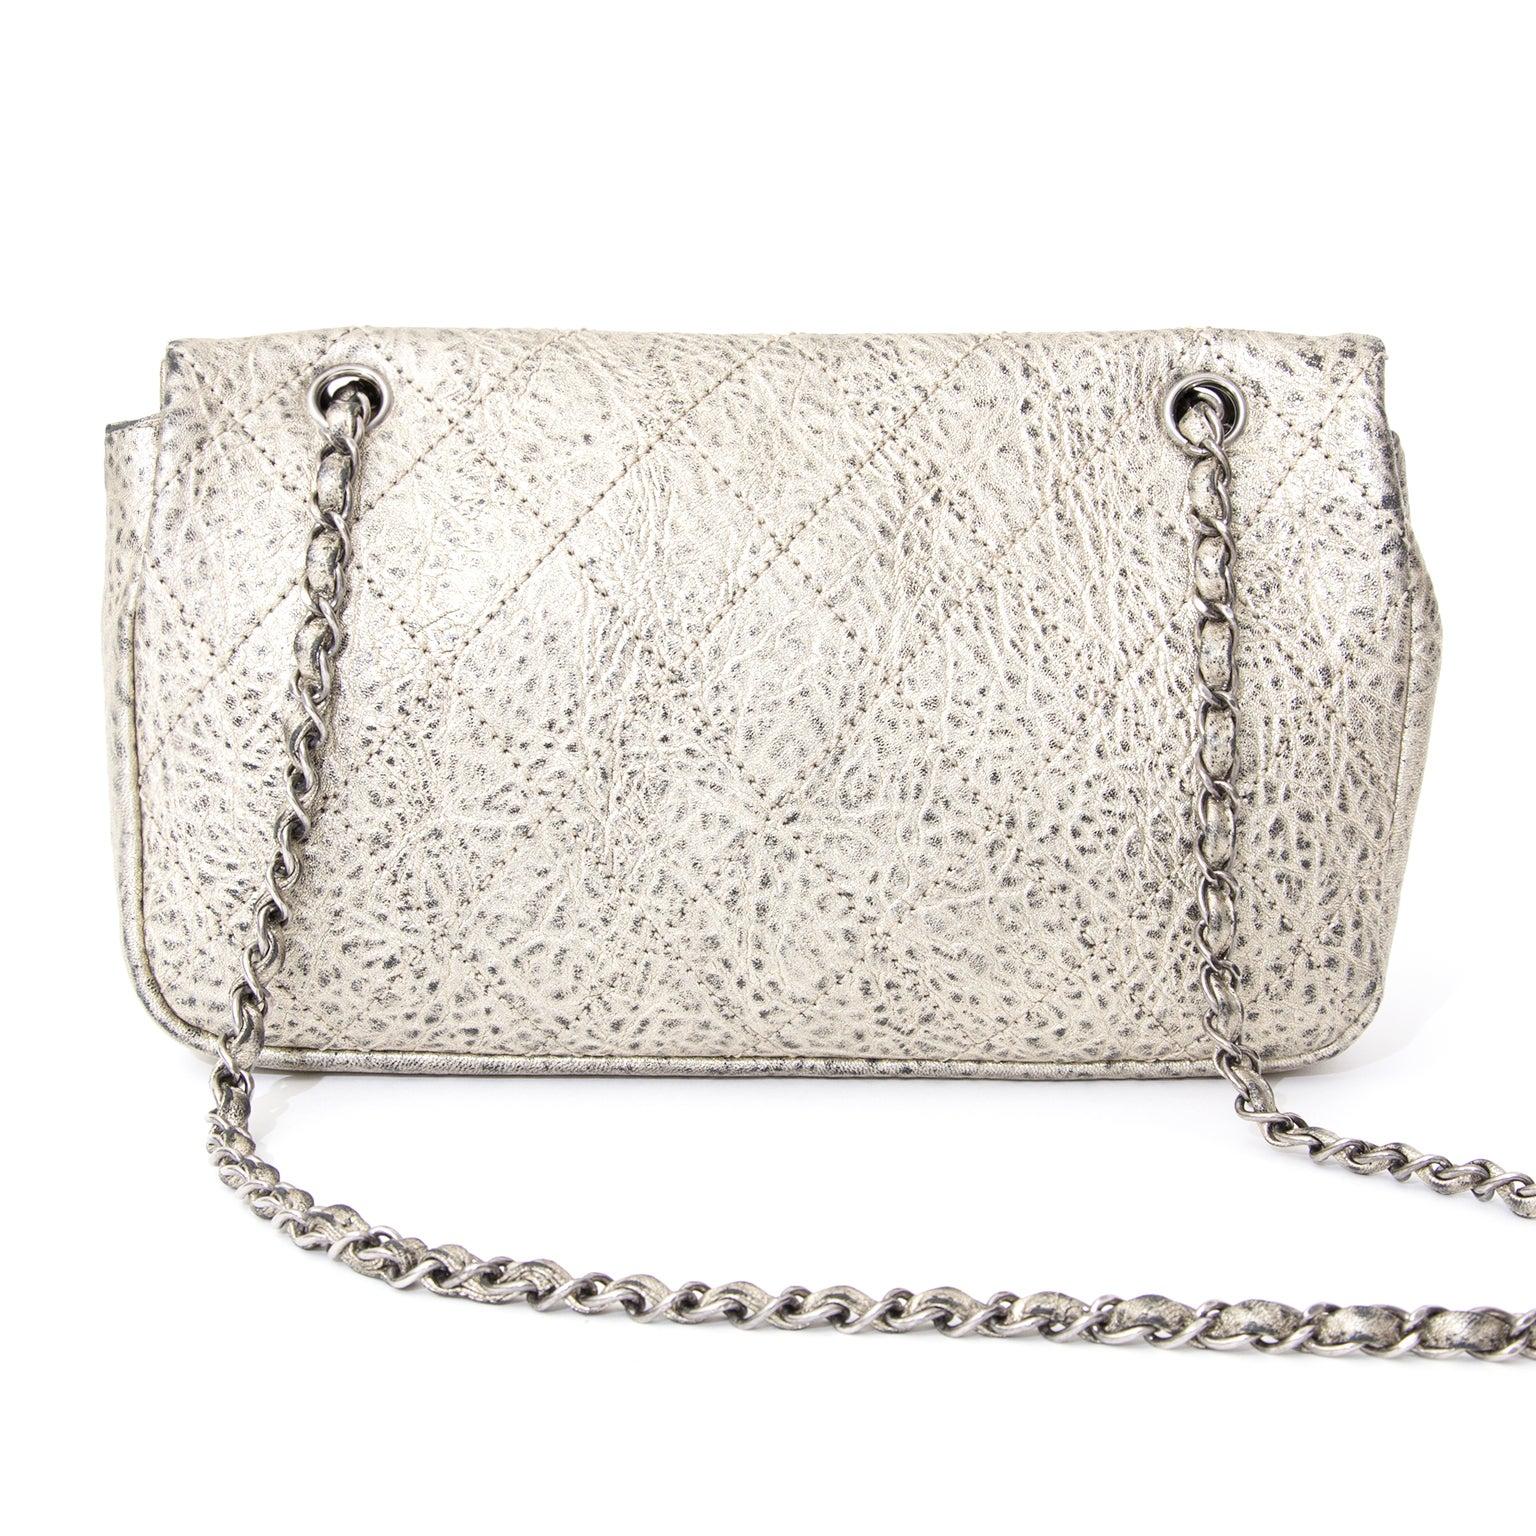 52c2a458ba5 Rare Chanel Aged Silver Classic Flap Bag at 1stdibs